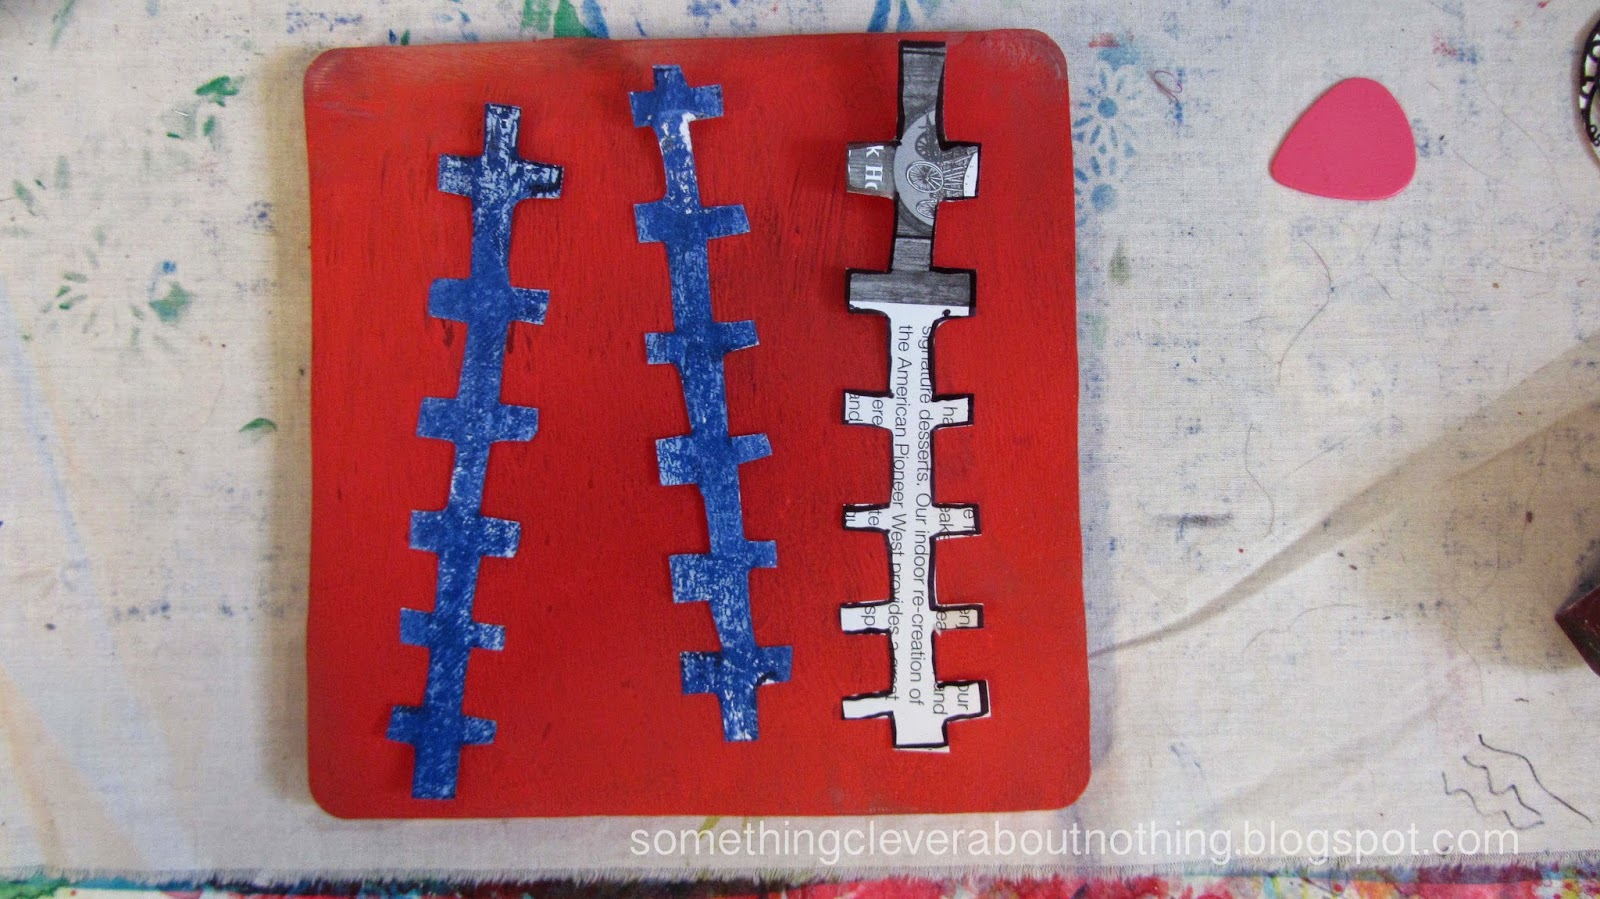 http://1.bp.blogspot.com/-RAXzTb6ks9c/U65DcImE_hI/AAAAAAAAOfY/-DVaxvSZHIo/s1600/workshop+thermofax+monoprint012.jpg